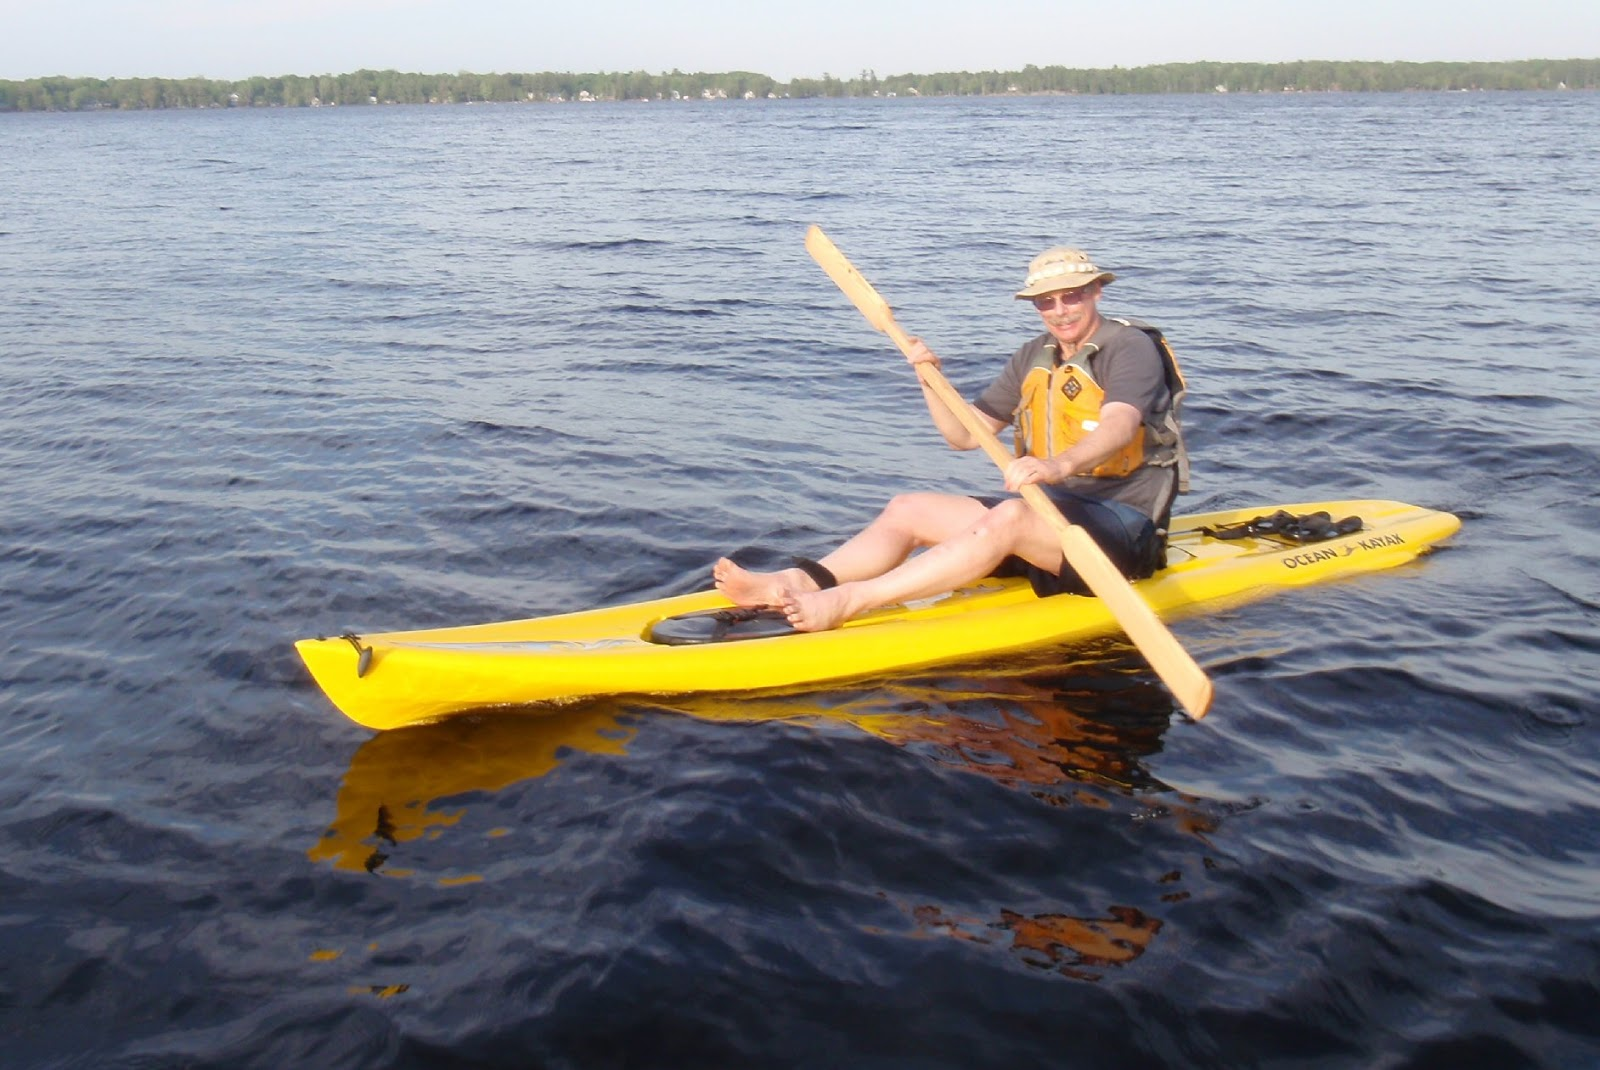 Penobscotpaddles Nalu 12 5 From Ocean Kayak